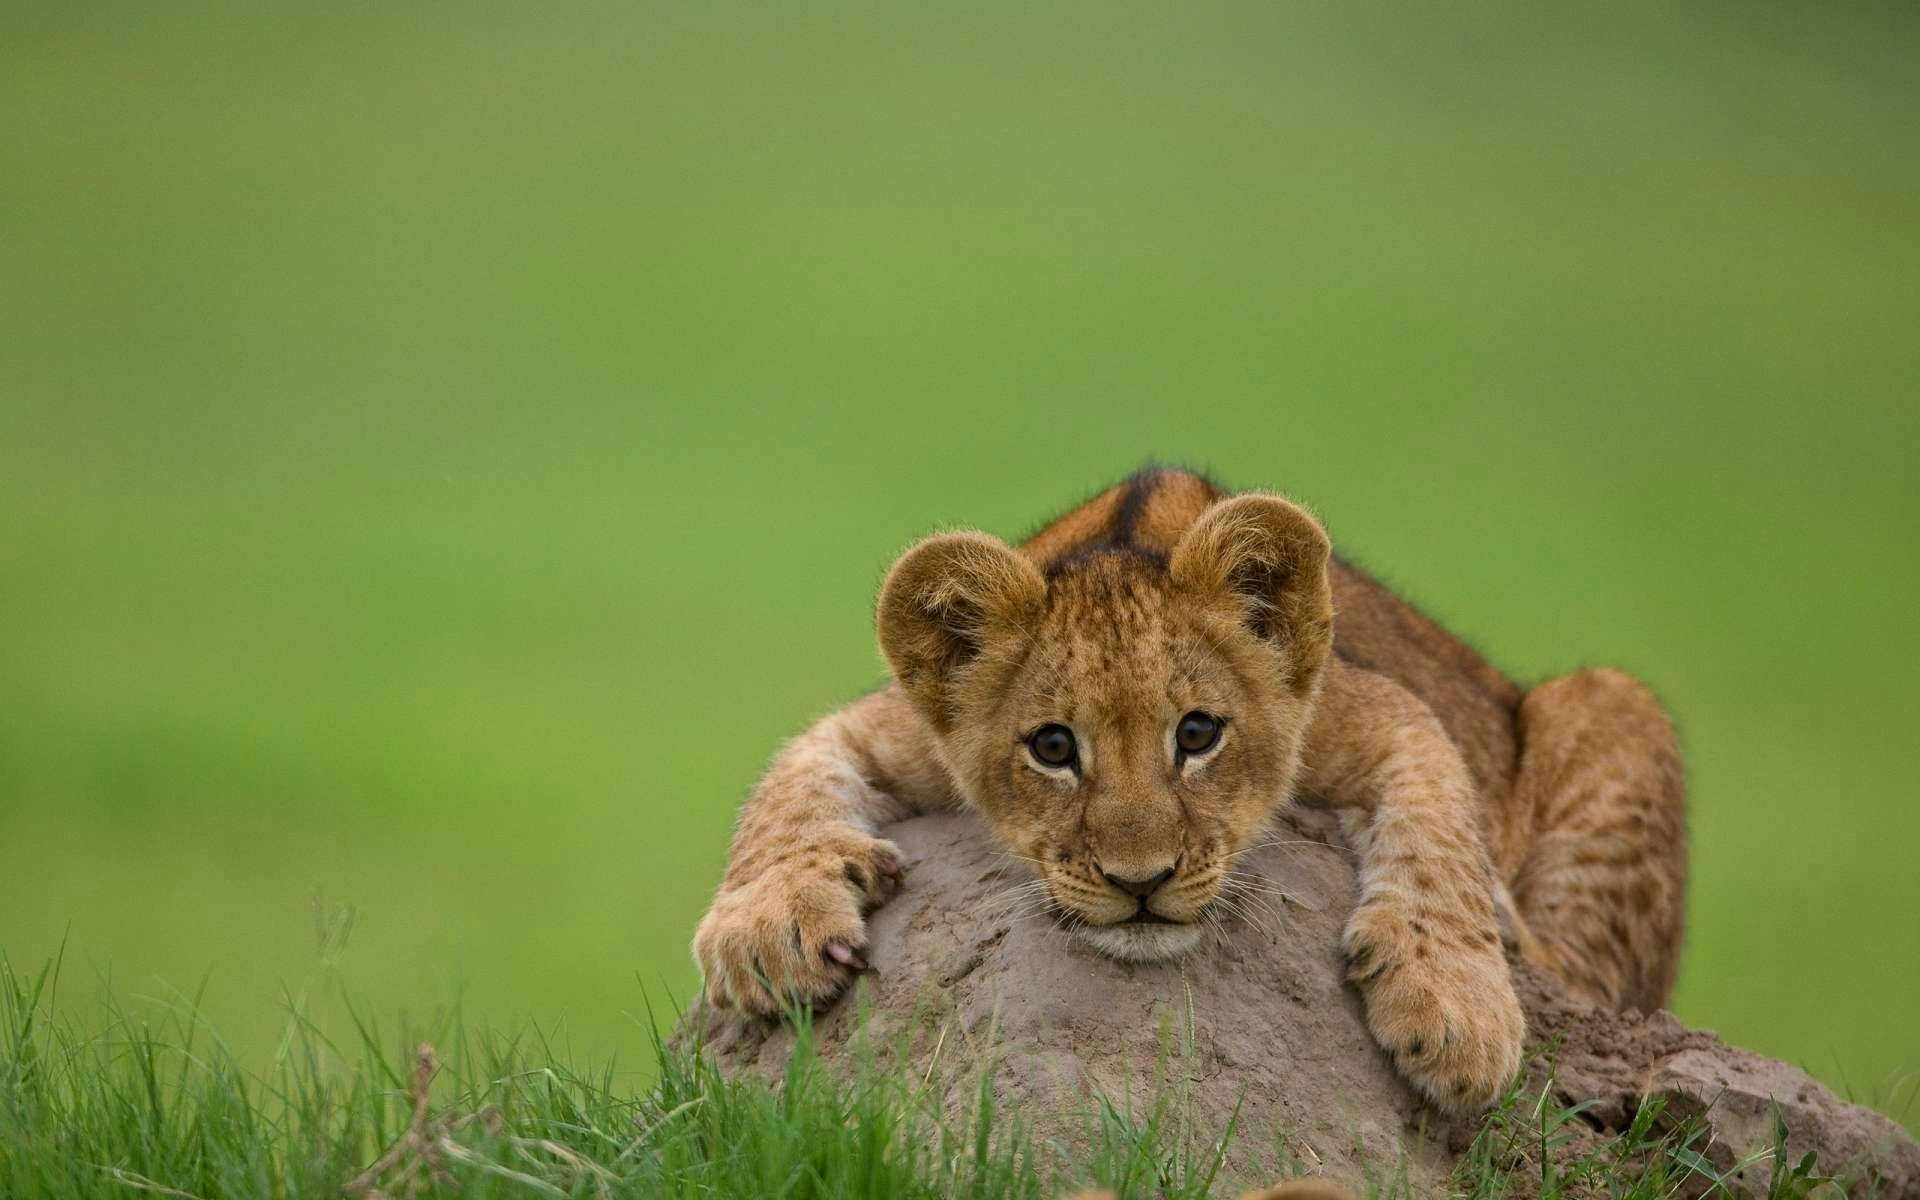 cute baby cheetah wallpaper | 1920x1080 | #12377